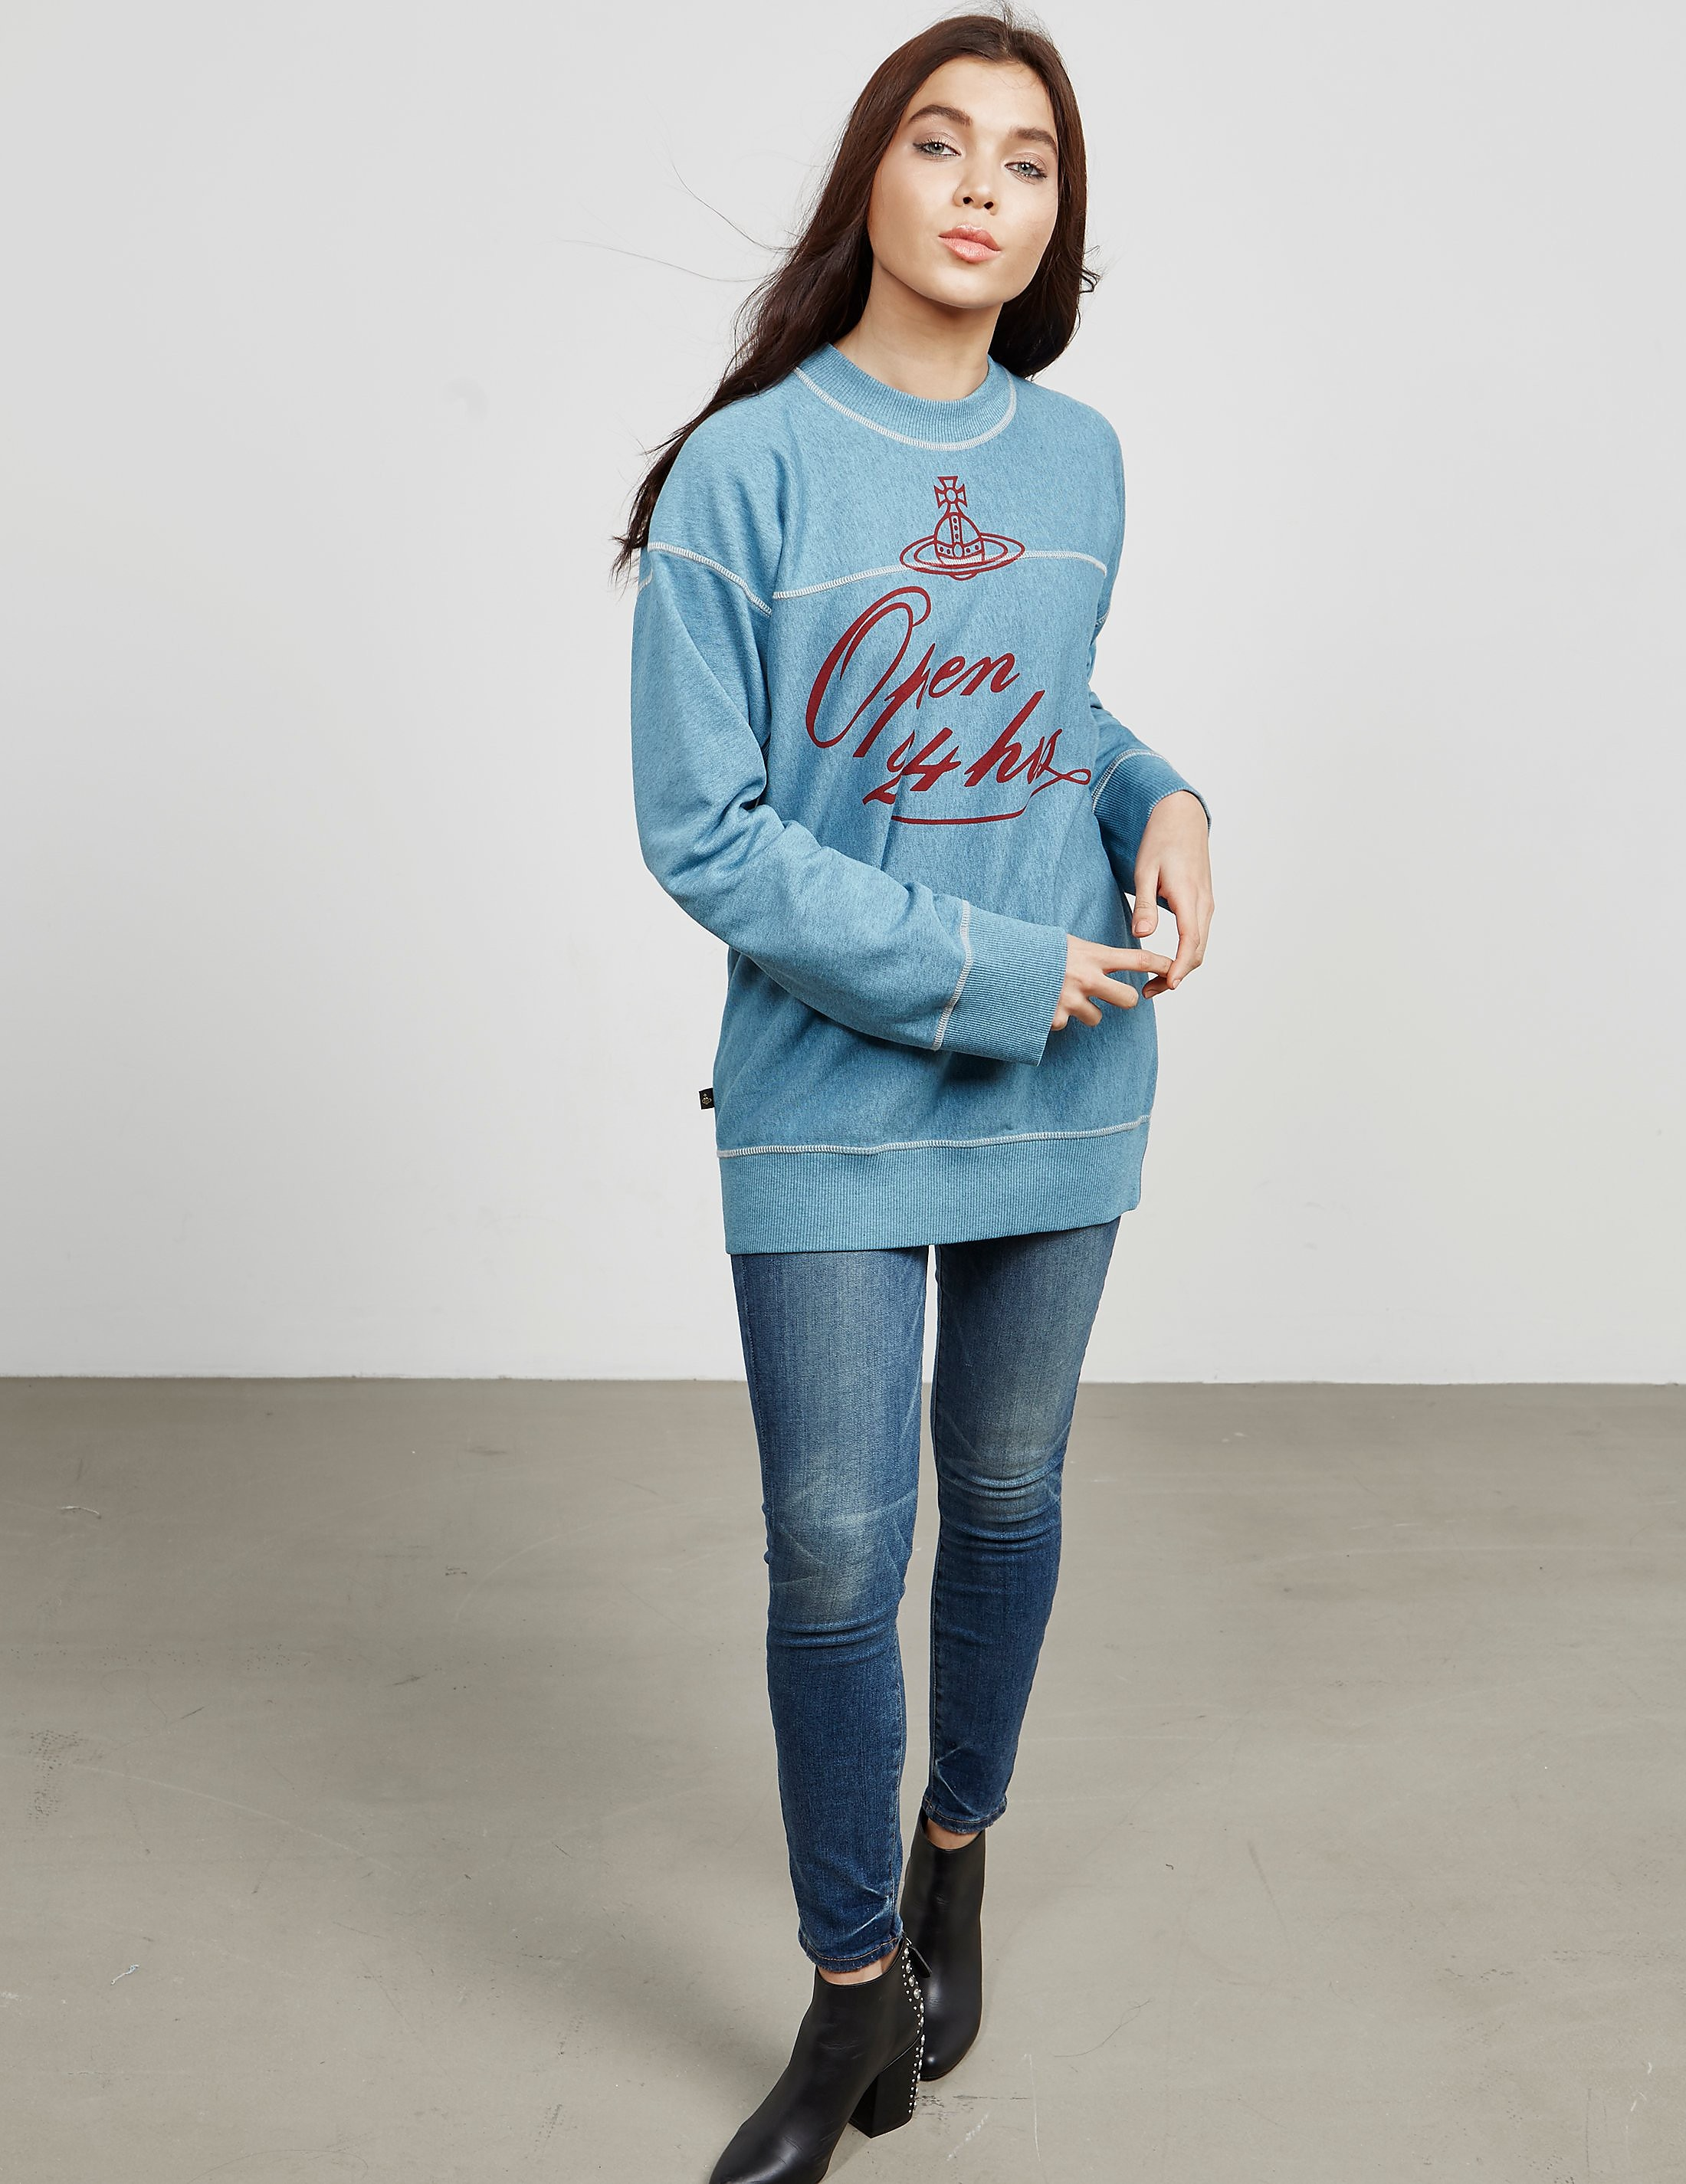 Vivienne Westwood Anglomania 24 Hours Sweatshirt